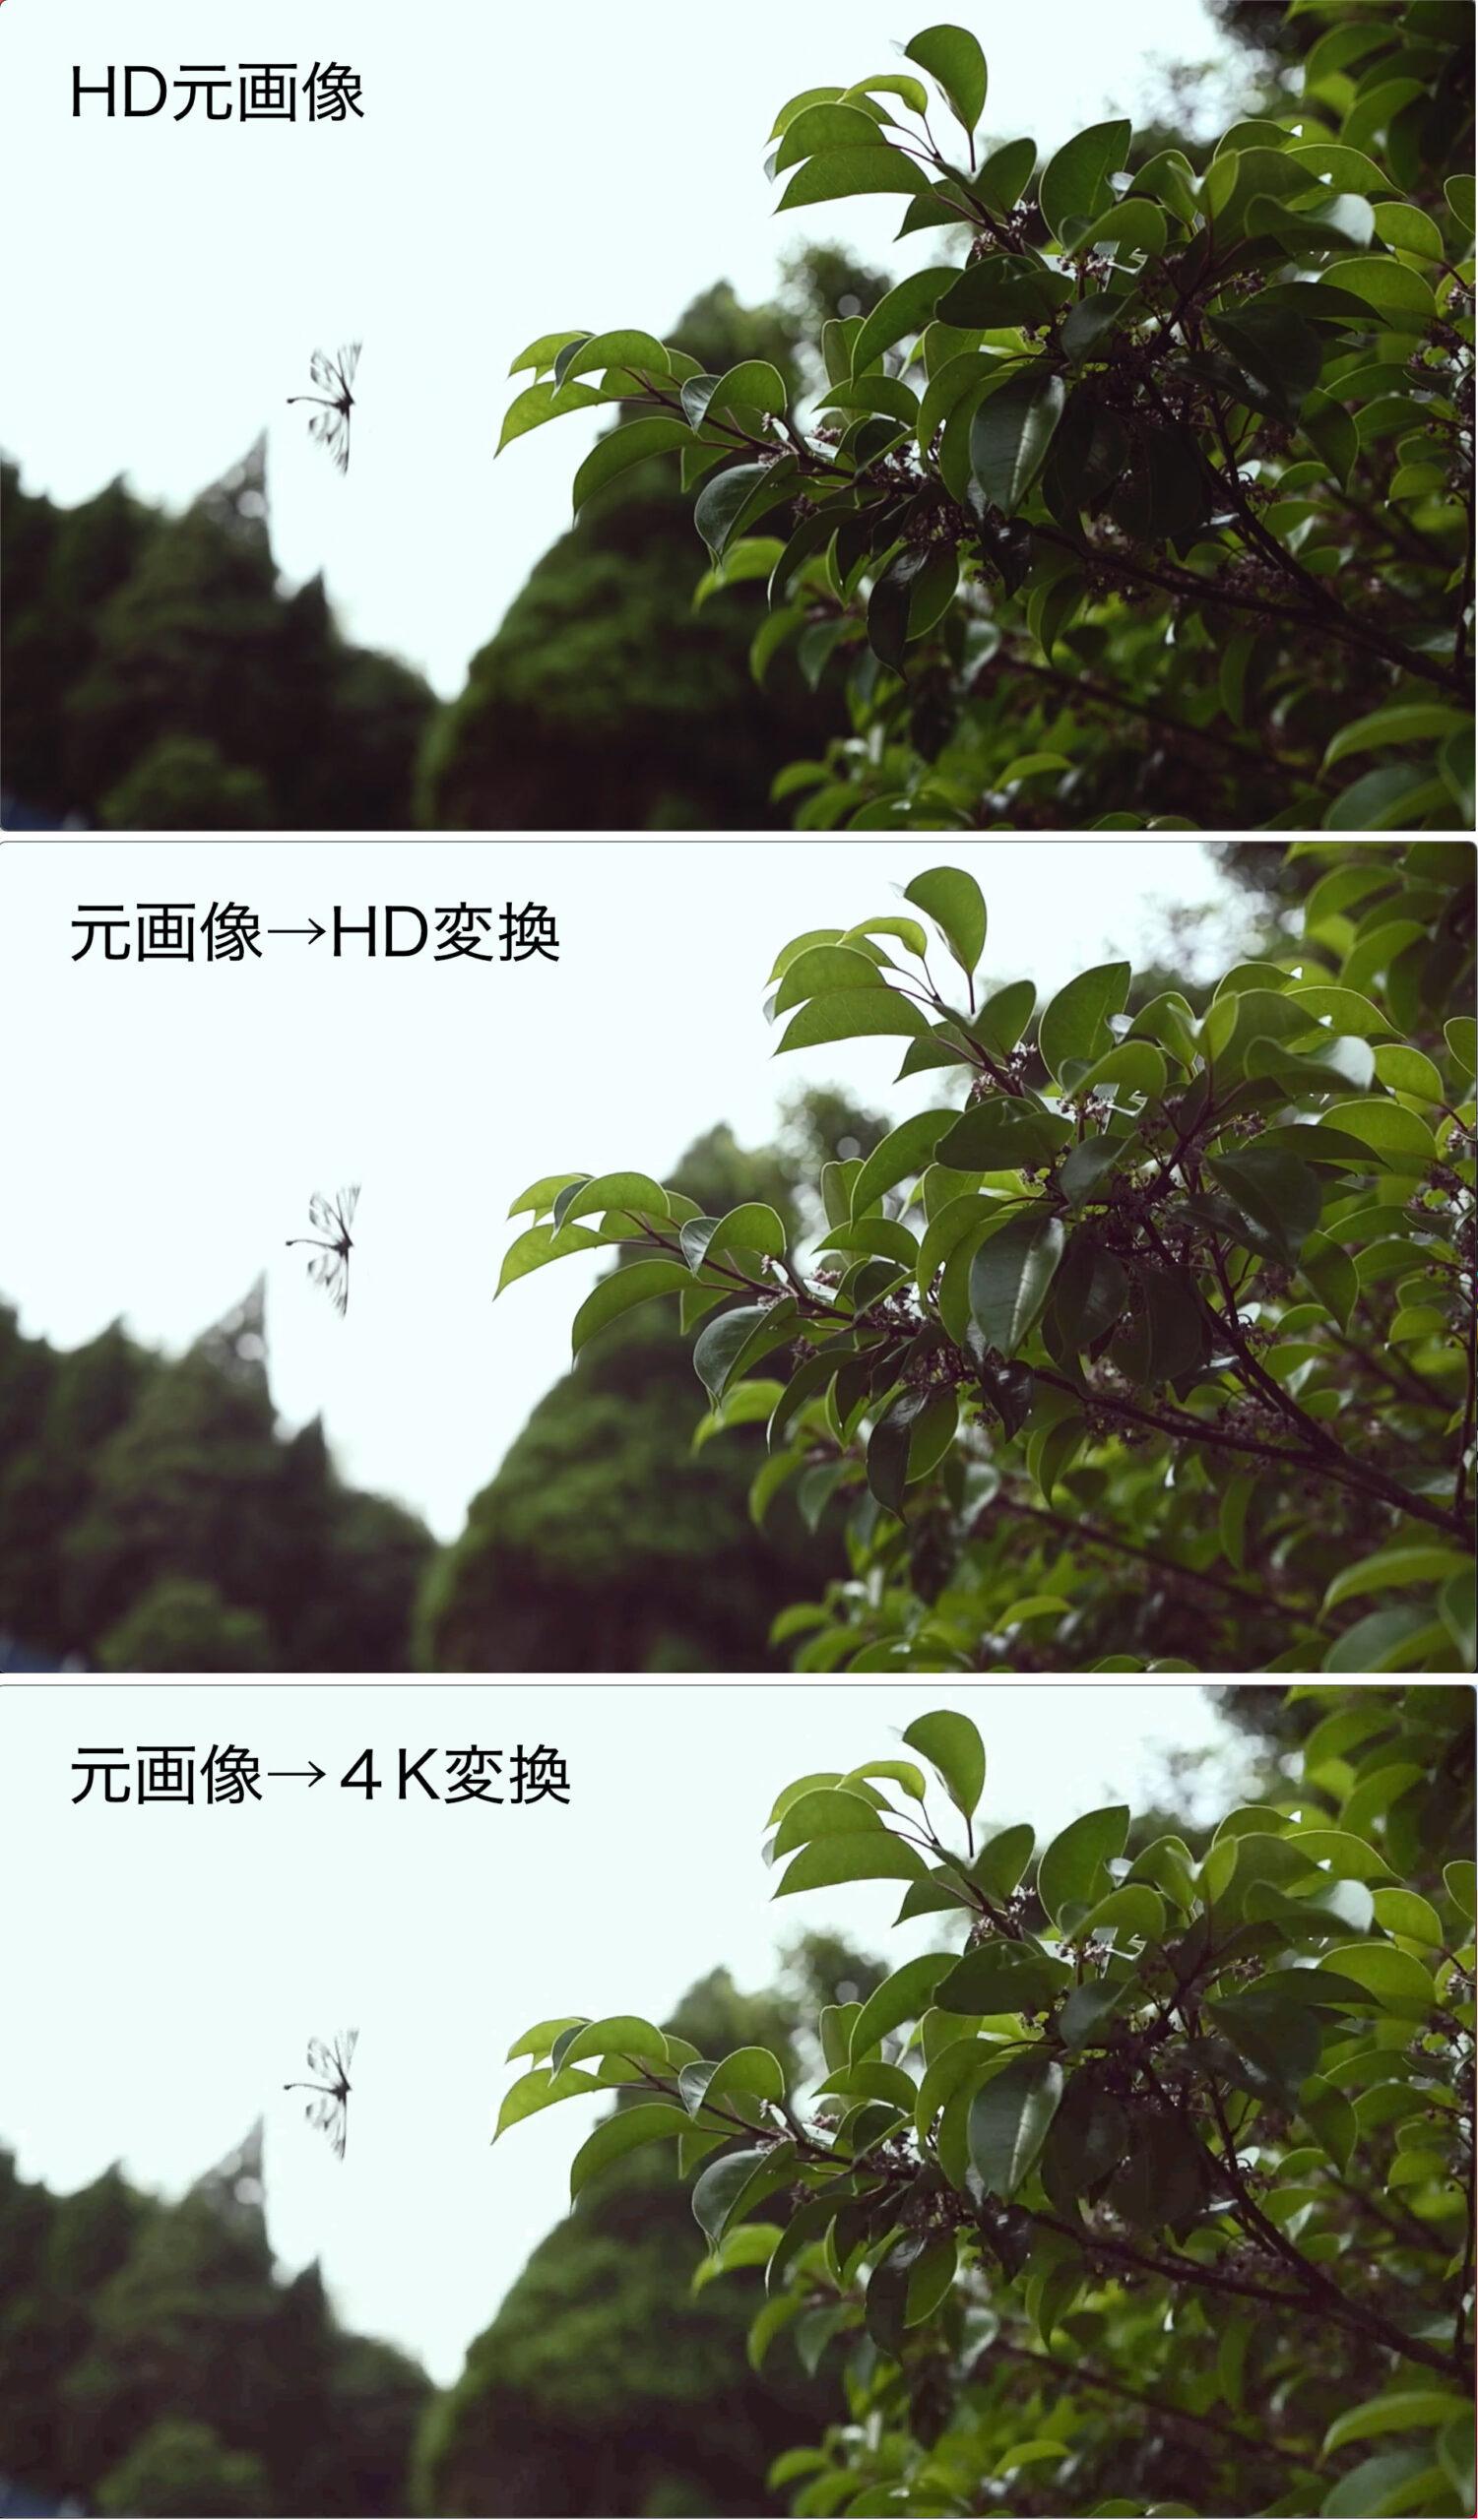 HD Video Converter Factory Pro 動画 4K/HD変換後の劣化比較画像